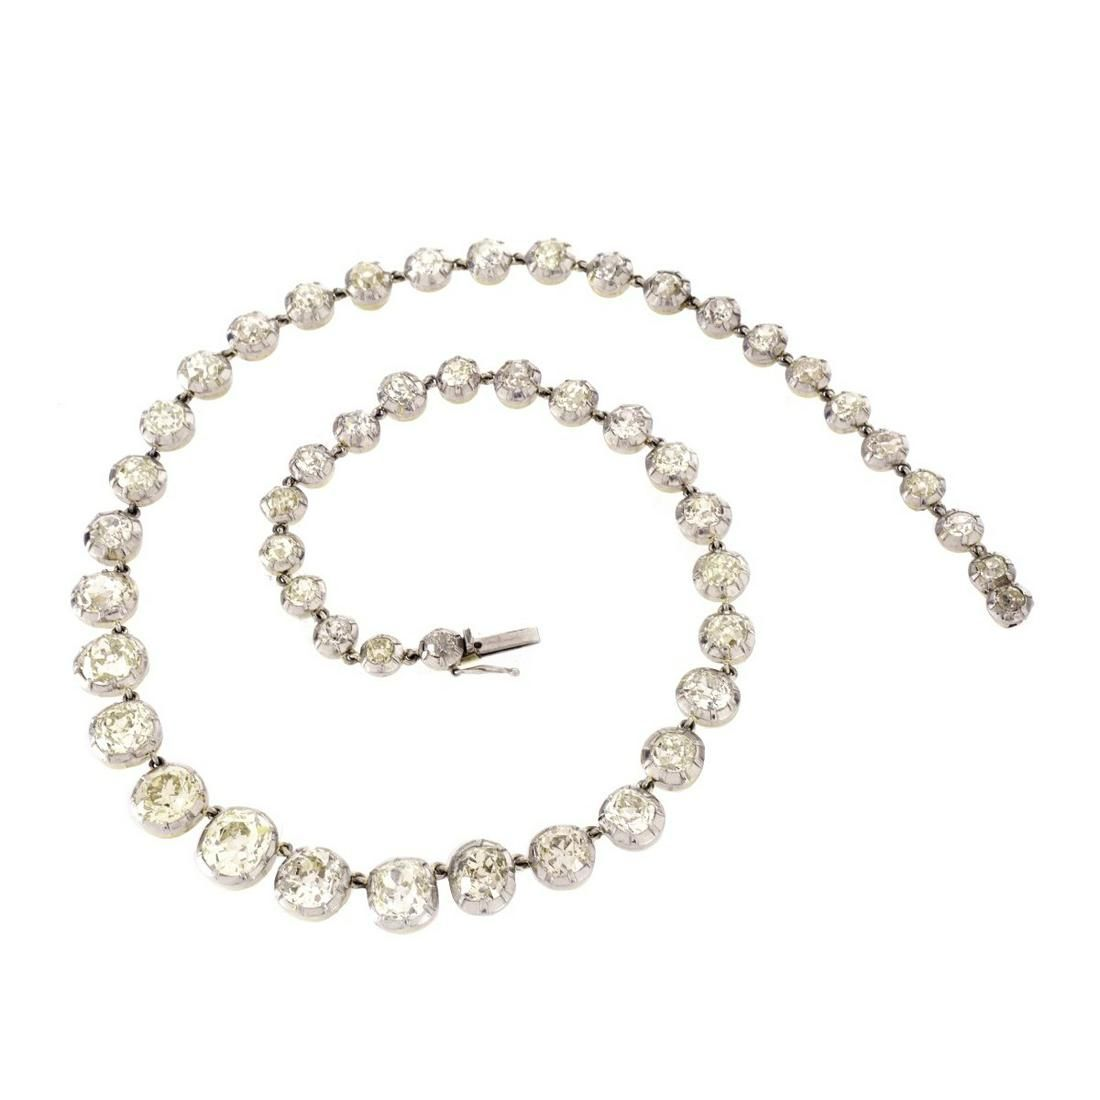 Diamond, Platinum and 18K Tennis Necklace